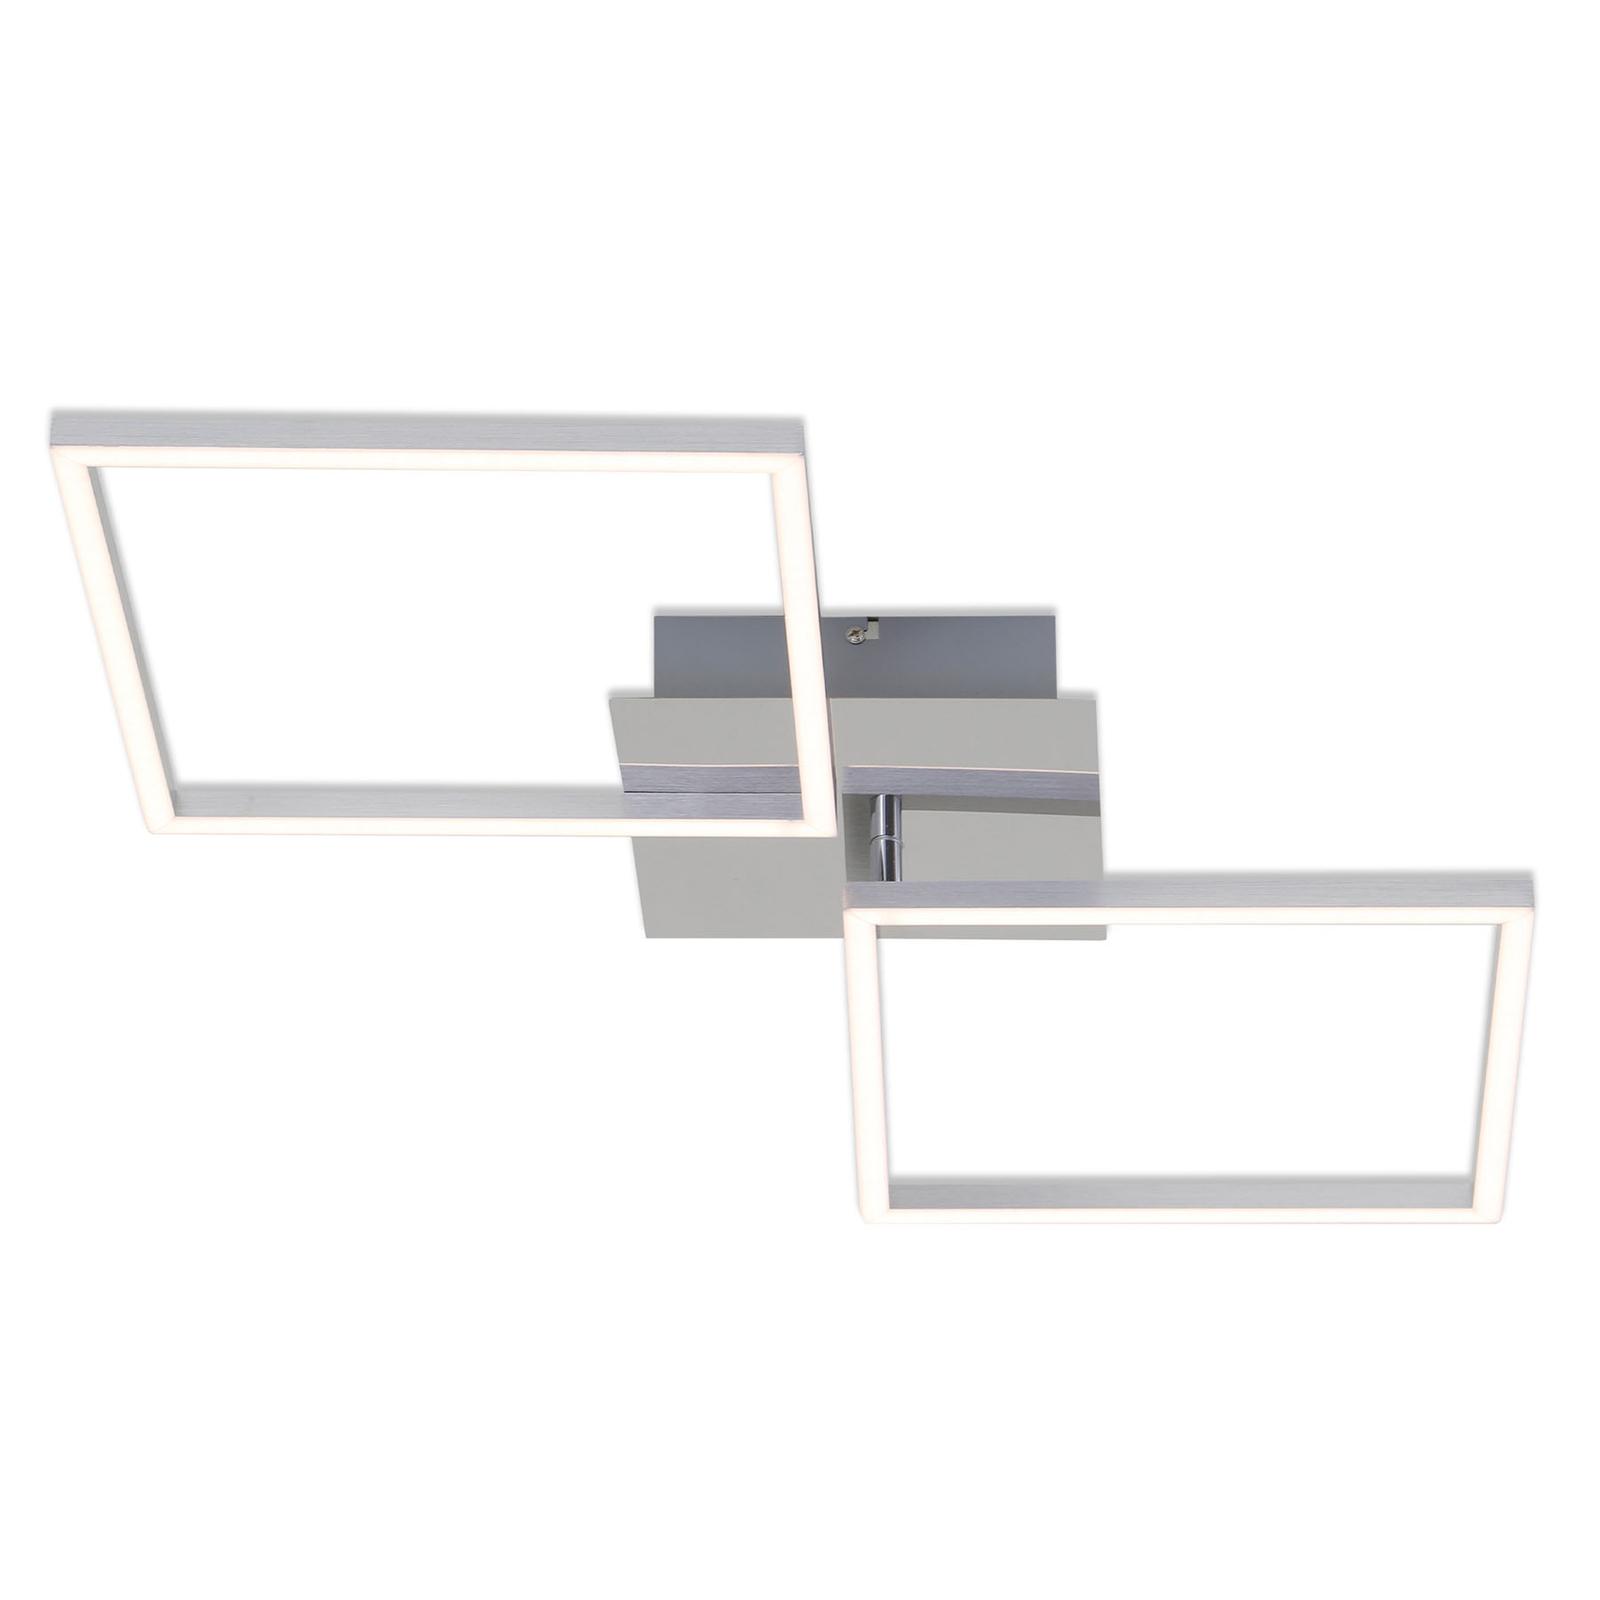 LED plafondlamp Frame, alu, 76x36cm